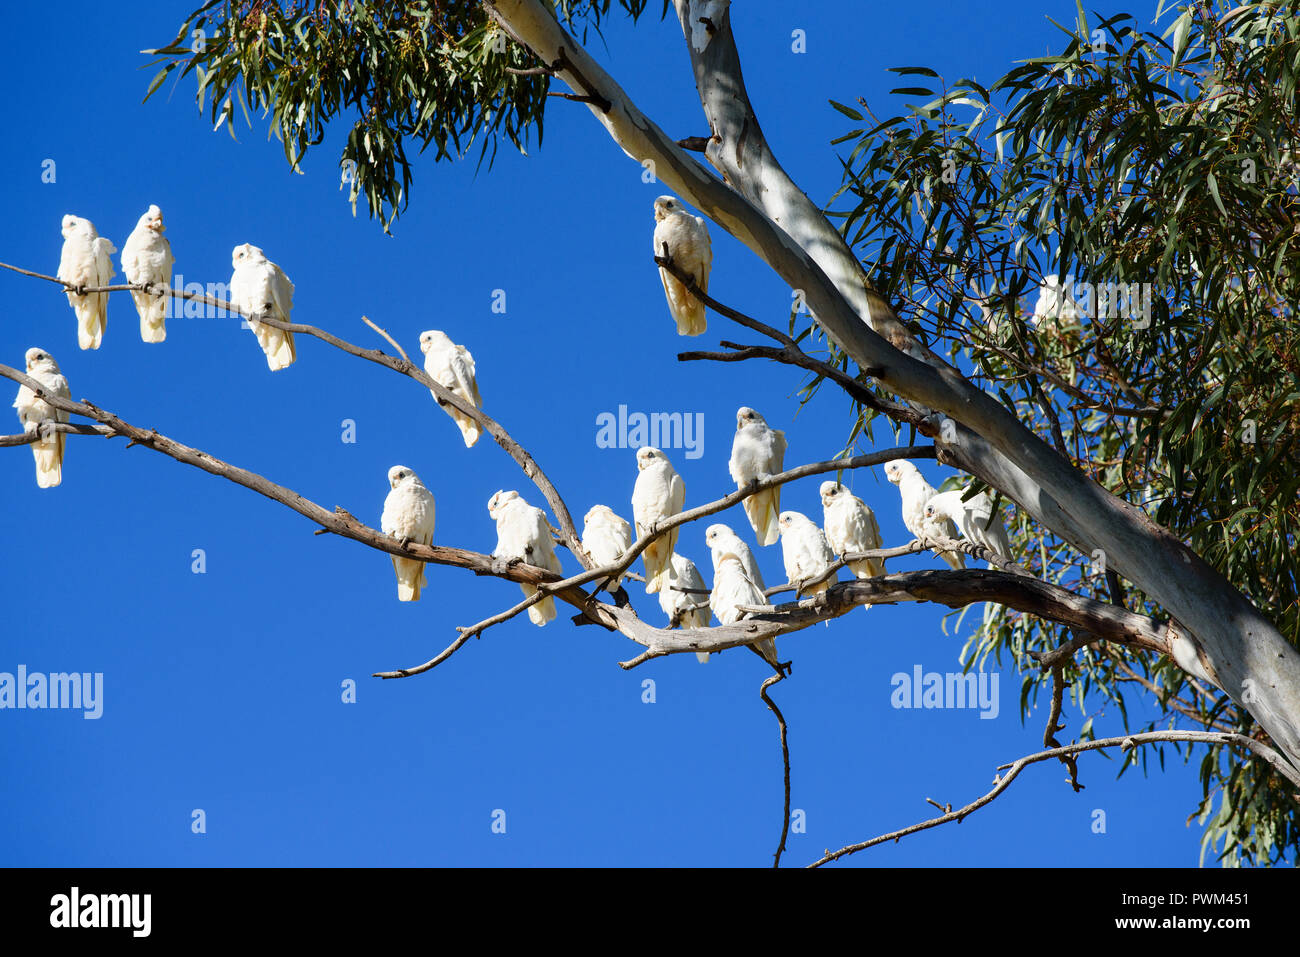 Flock of white birds, corellas, in gum tree with blue sky background, South Australia, Australia - Stock Image